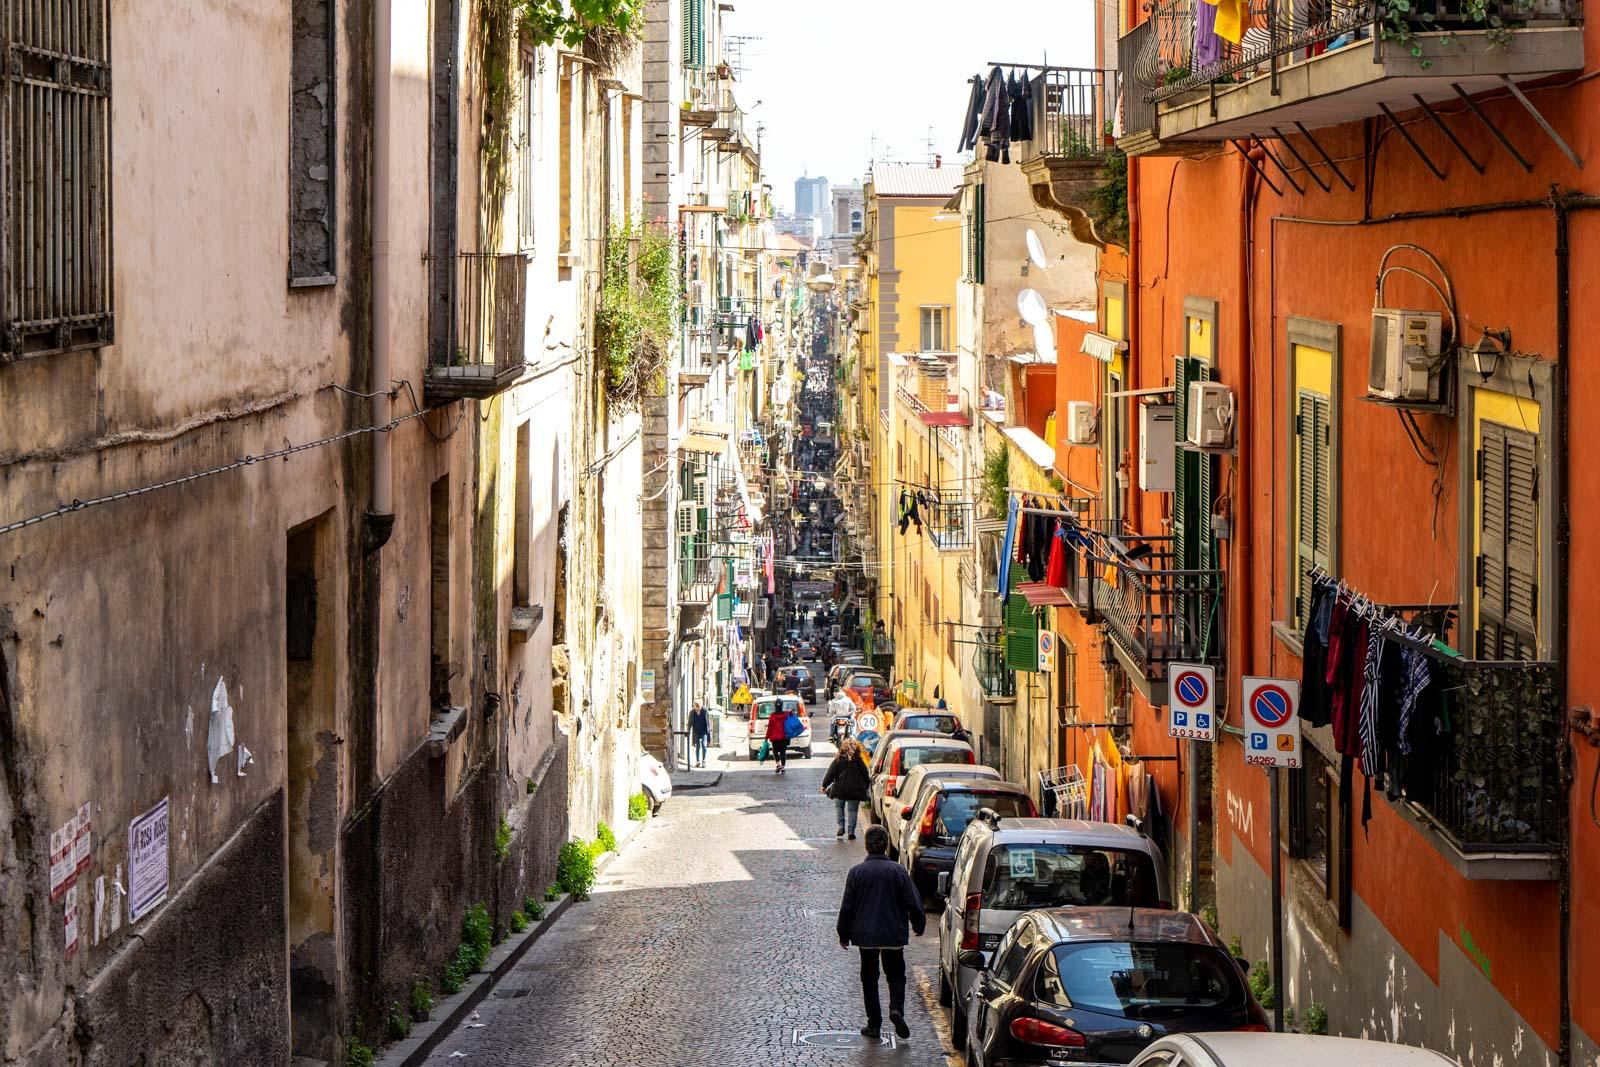 Santa Maria de Sette Dolori, Naples, Italy